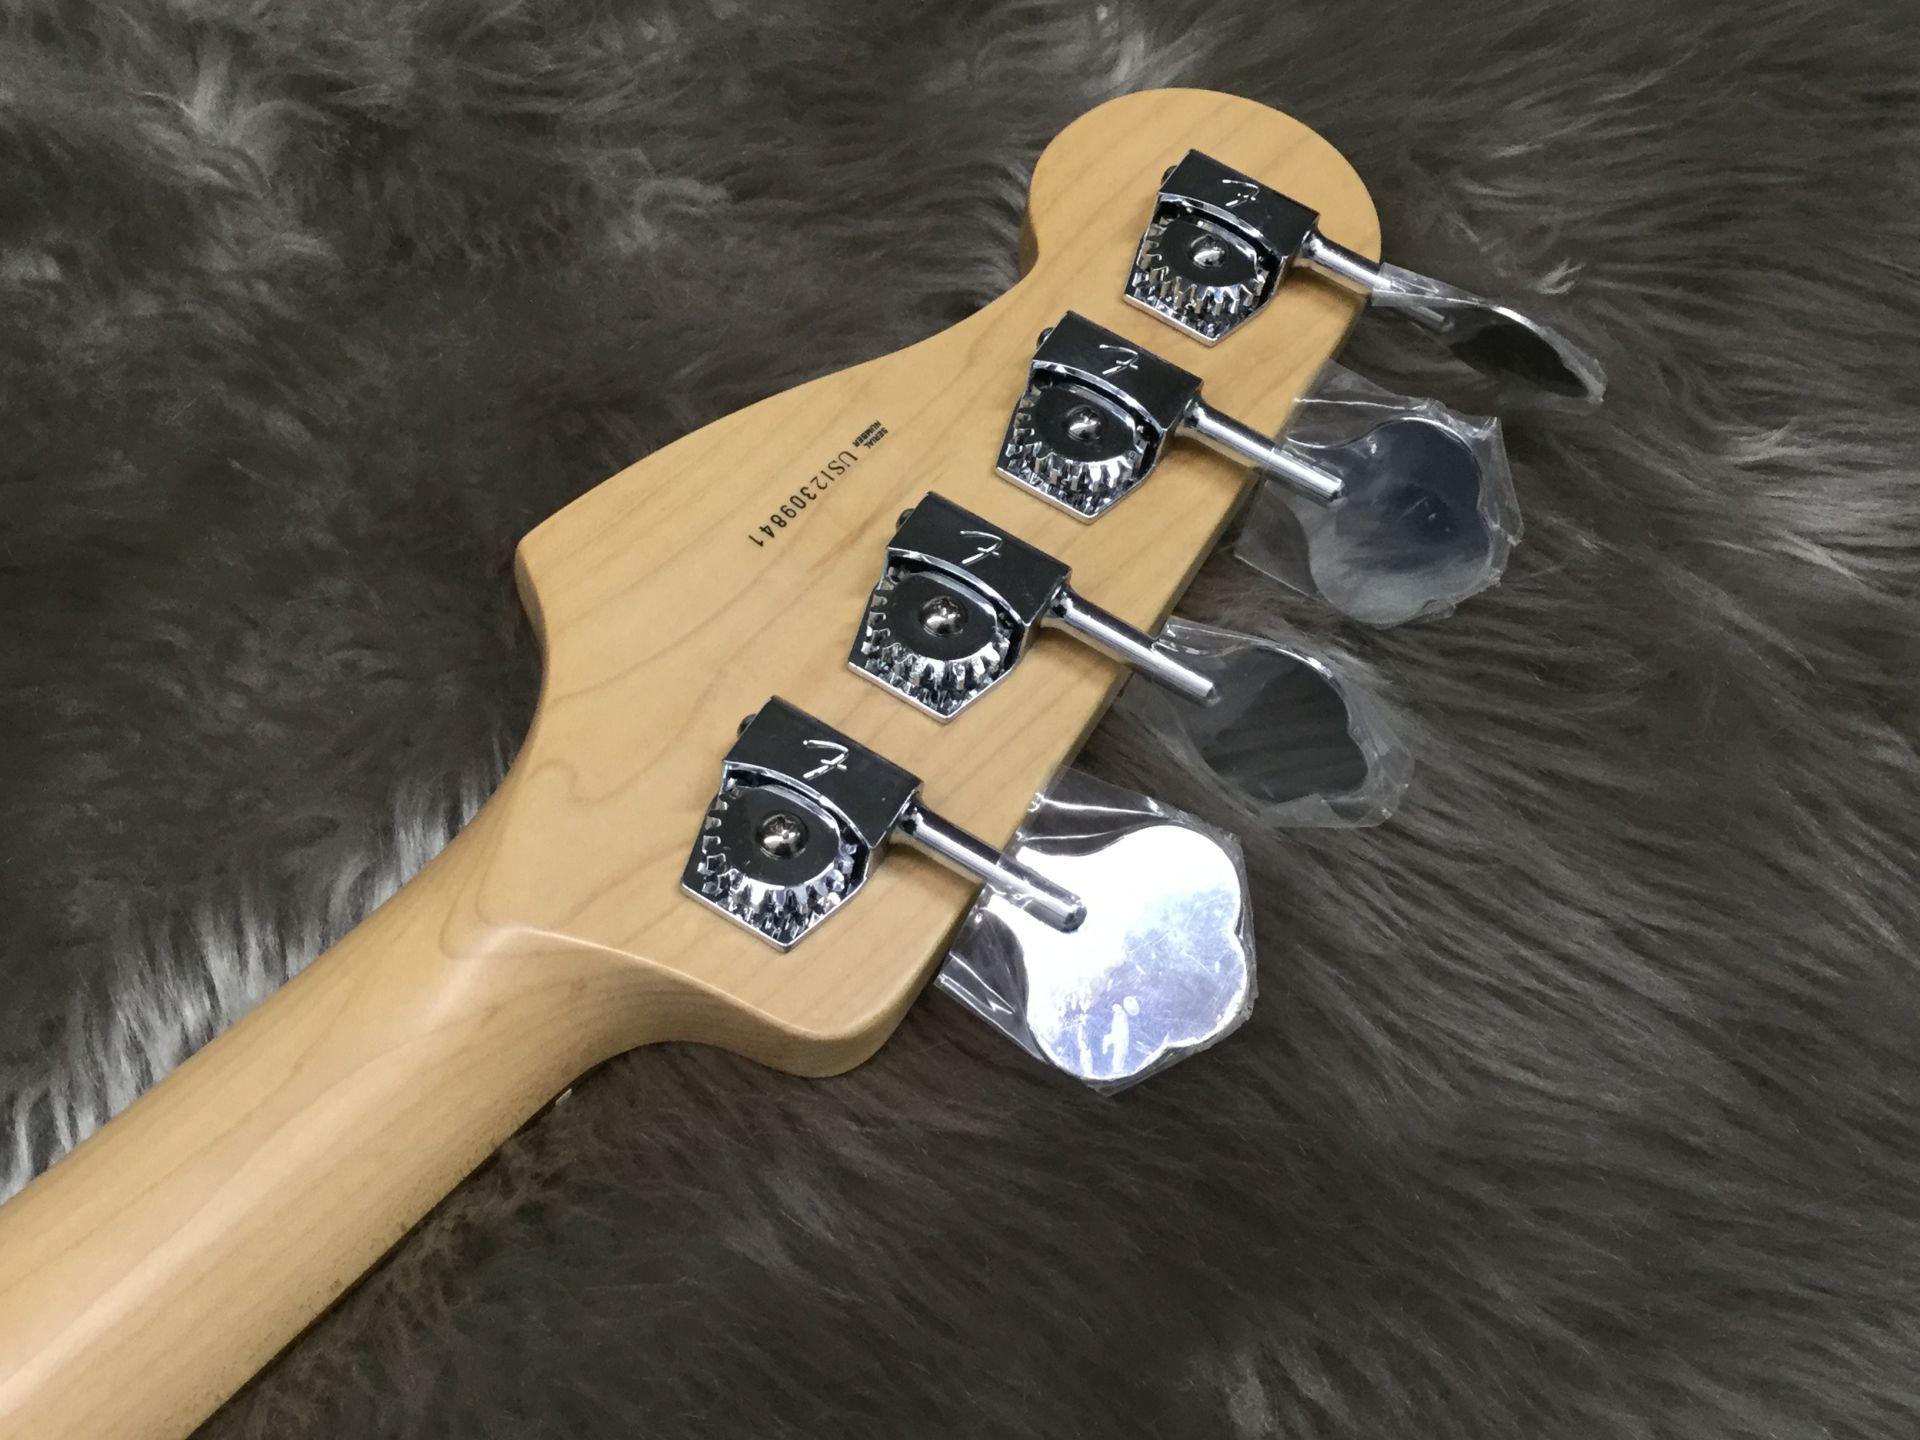 American Standard P-Bass UG/Rのヘッド裏-アップ画像